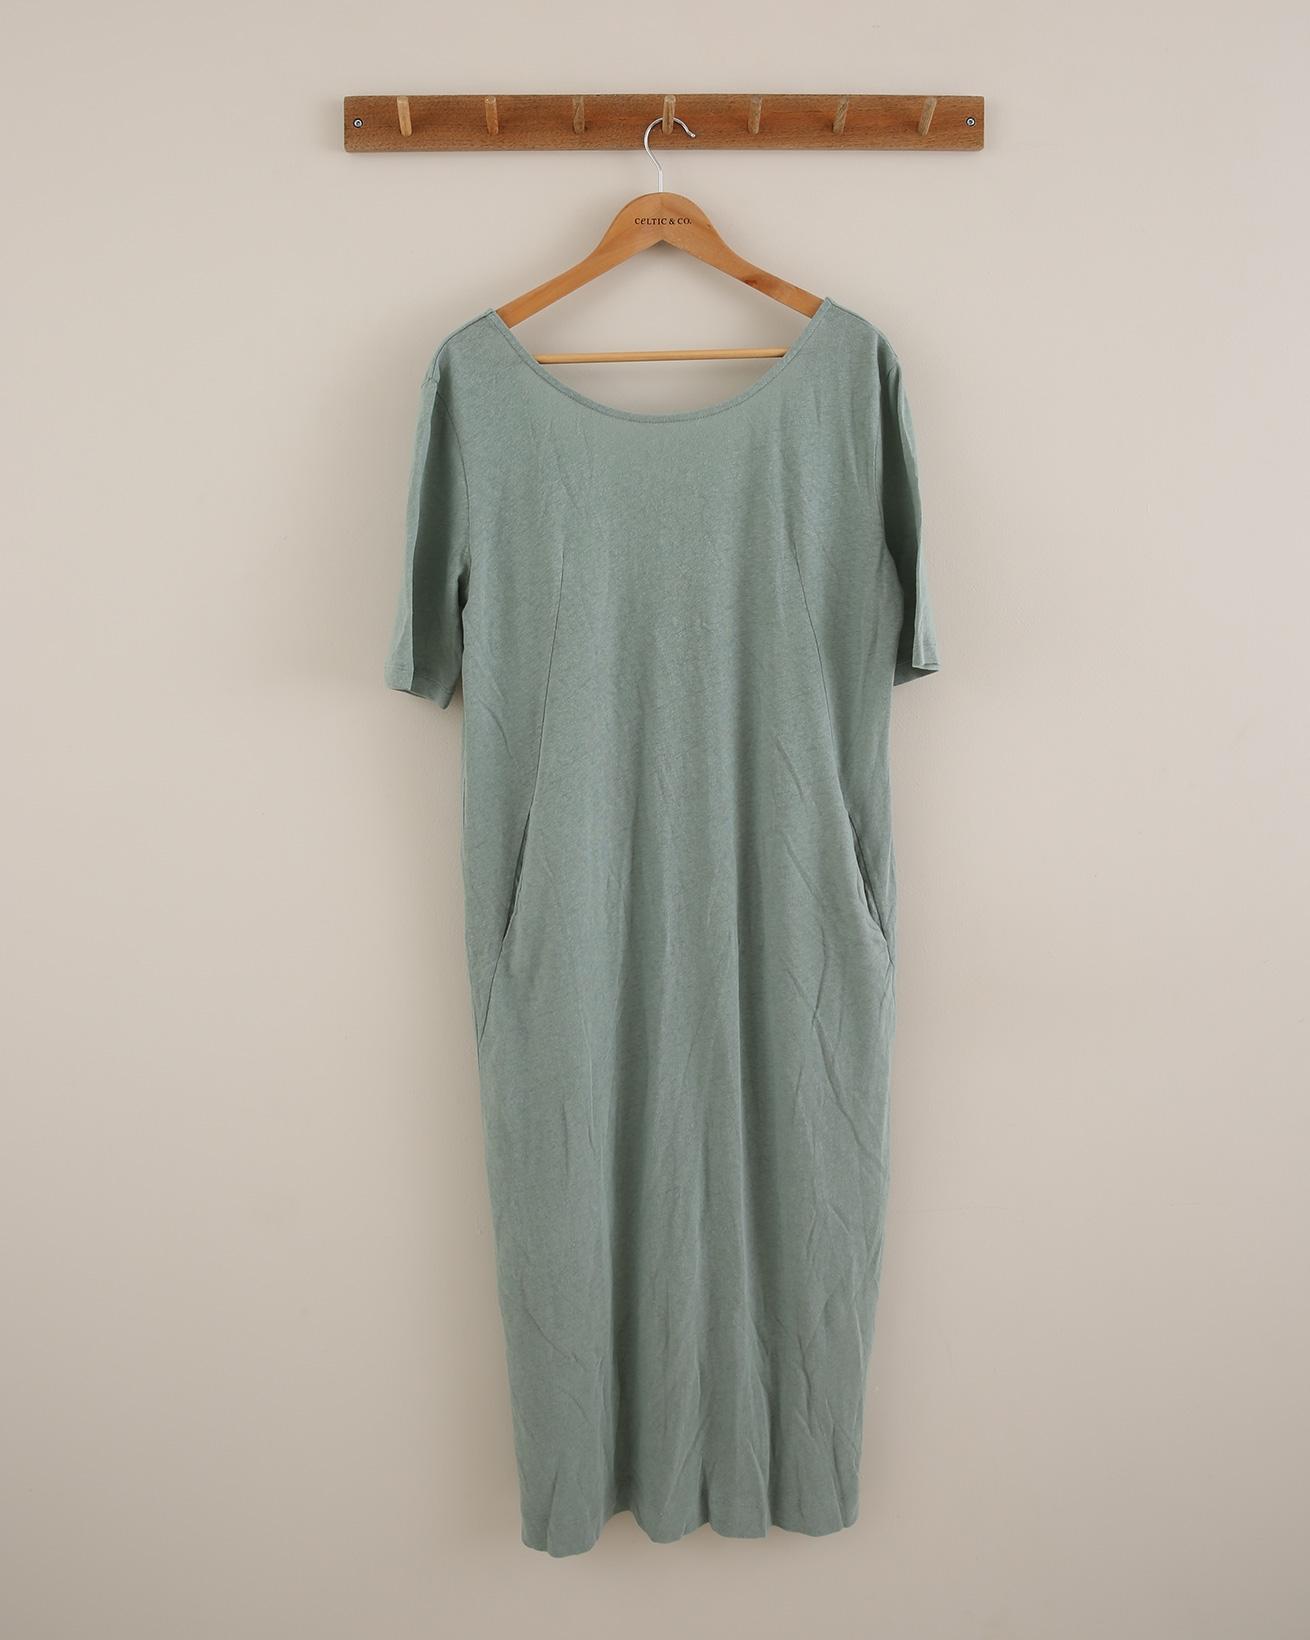 Linen Button Back Dress - Size 14 - Sage Green - 1809